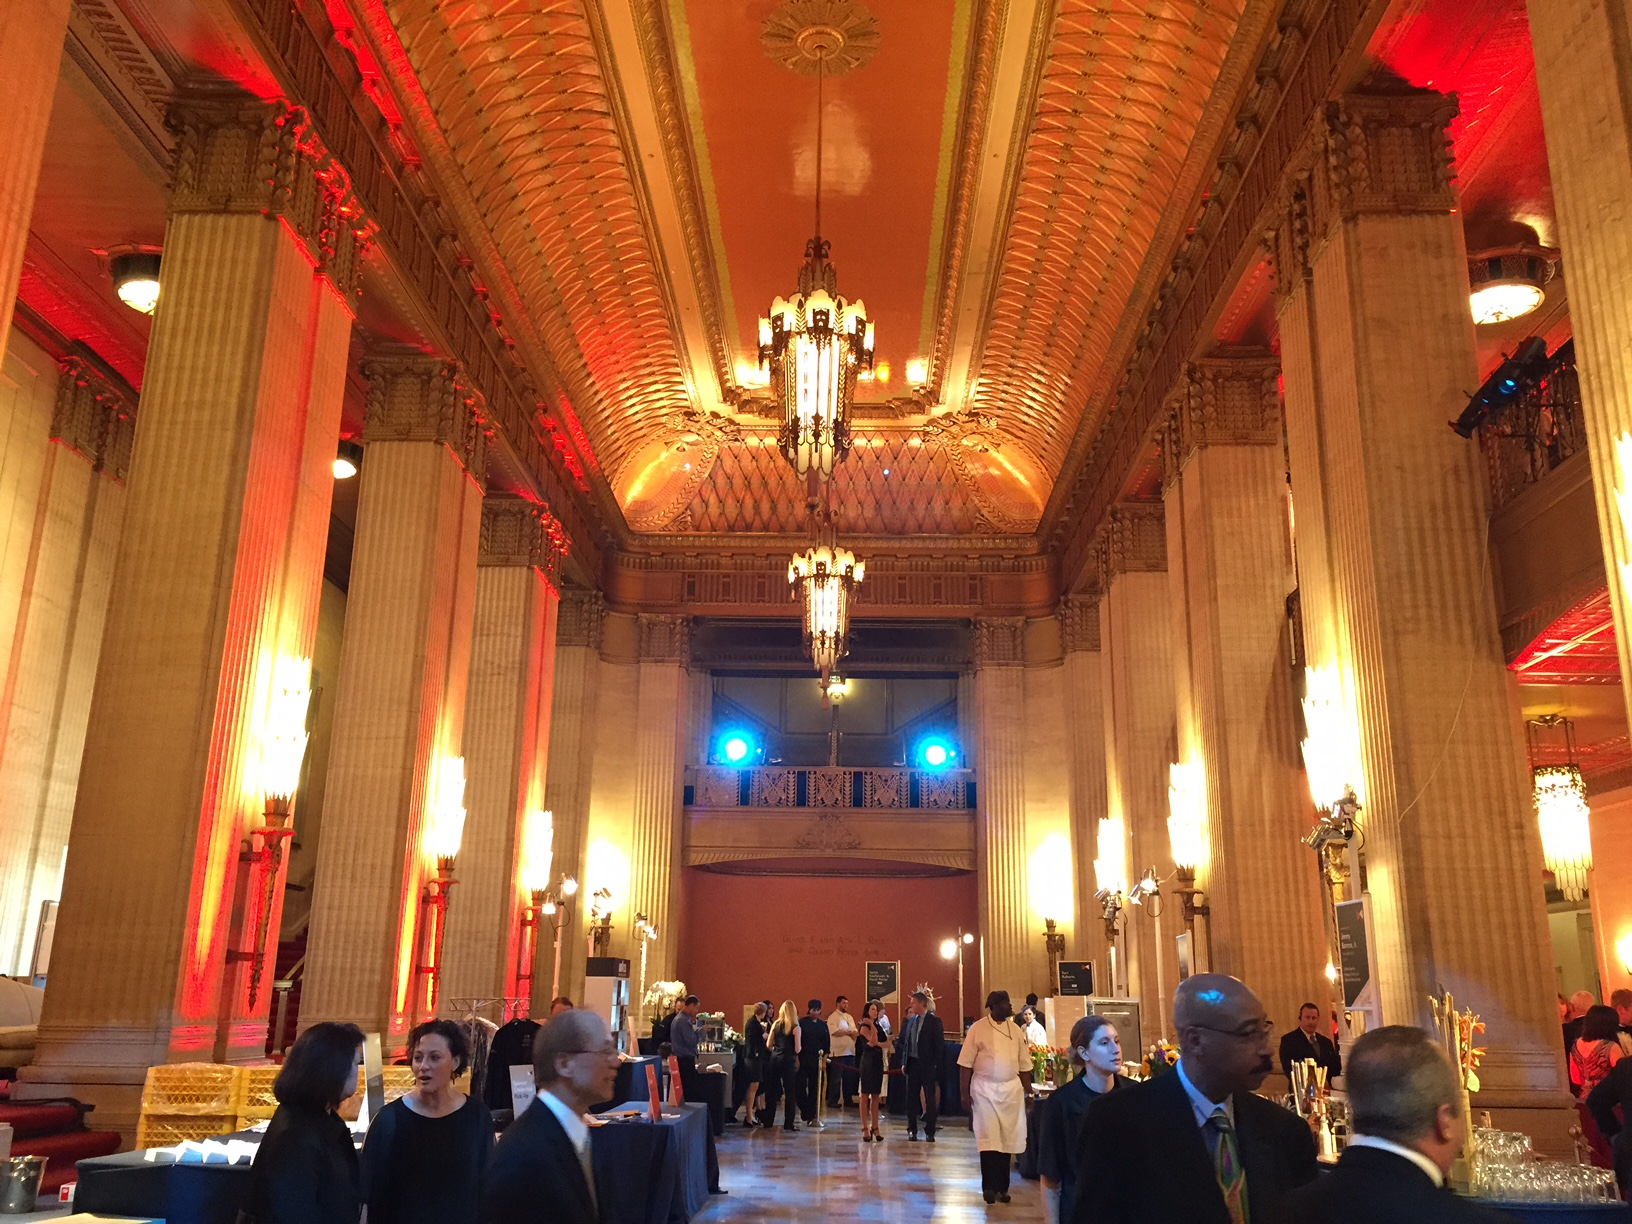 Lyric Opera House, Chicago